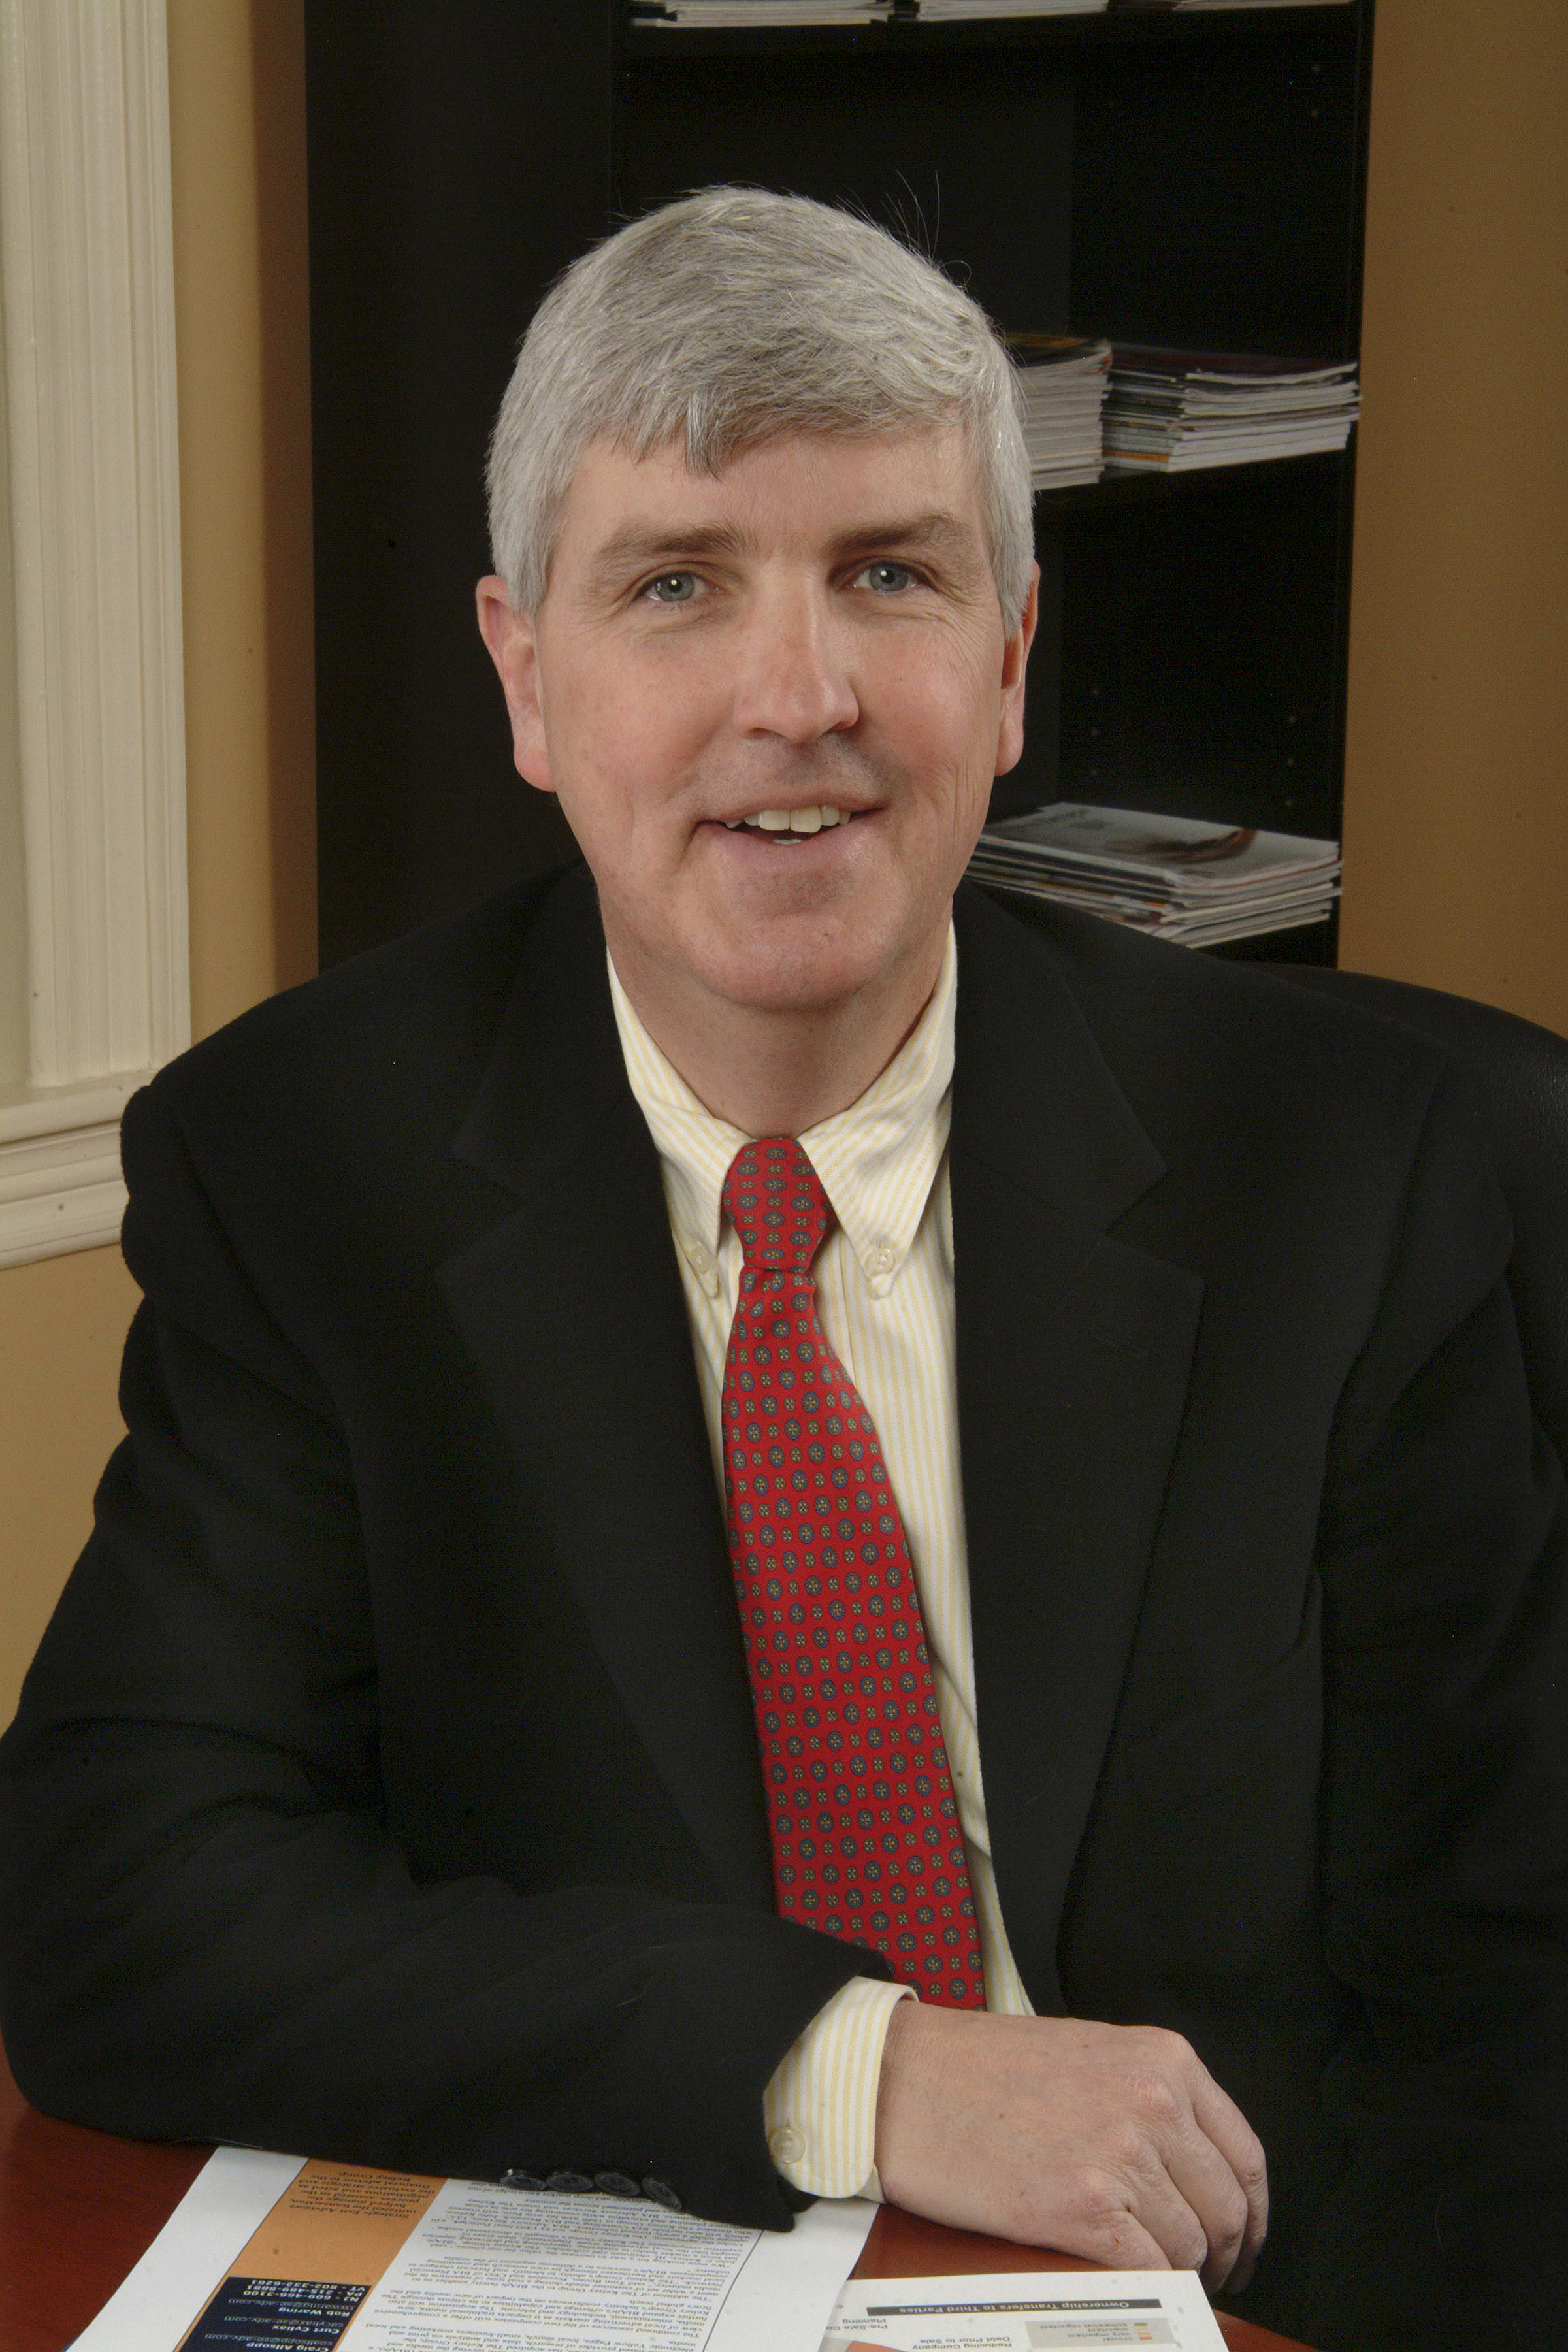 Curt Cyliax, Managing Partner of Strategic Exit Advisor